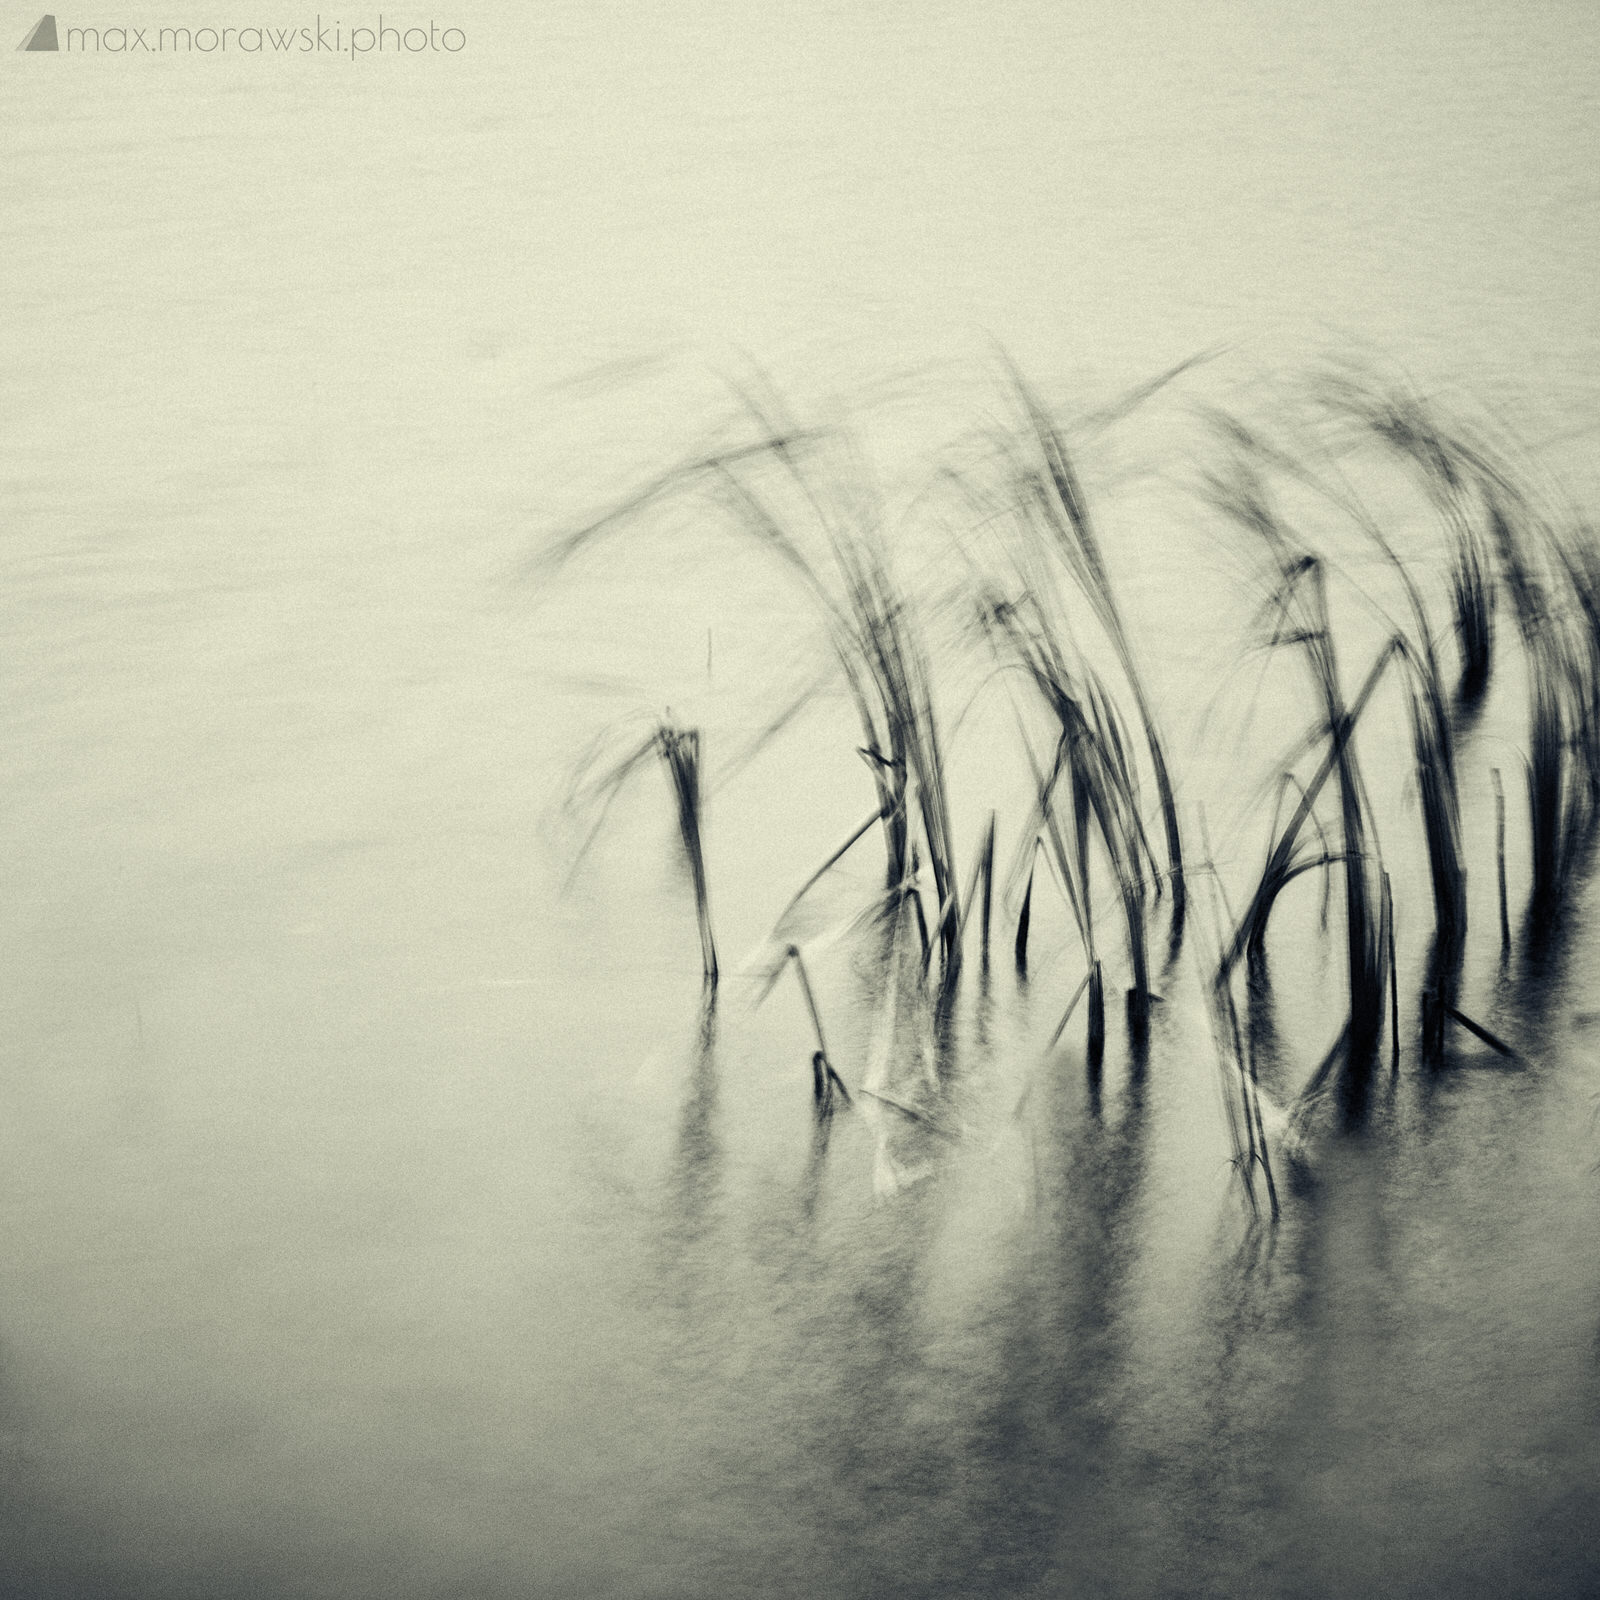 November Reeds; Charcoal study #4